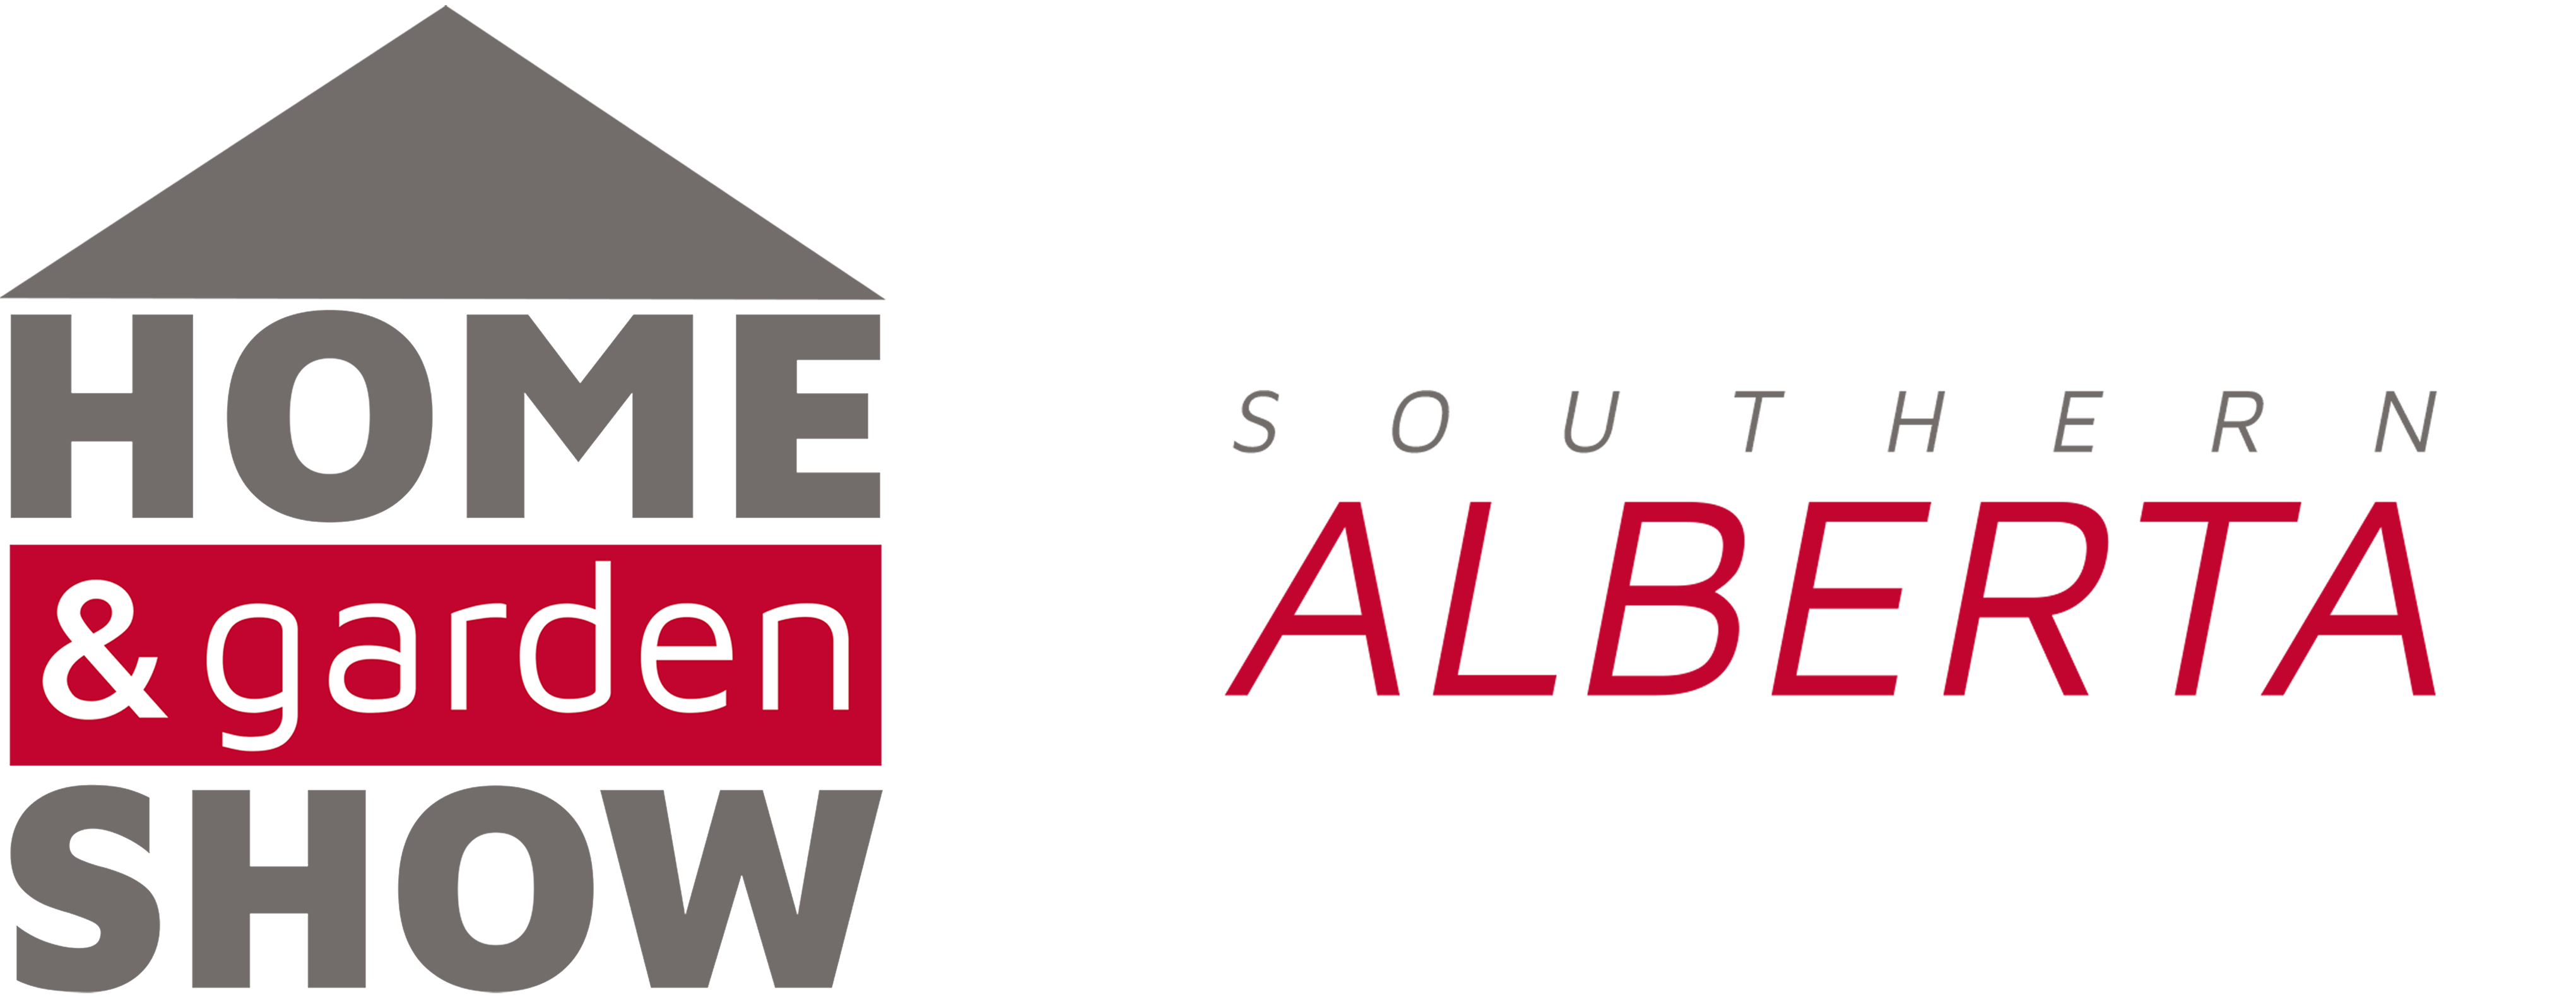 Home & Garden Show   Exhibition Park   Lethbridge, AB   Canada